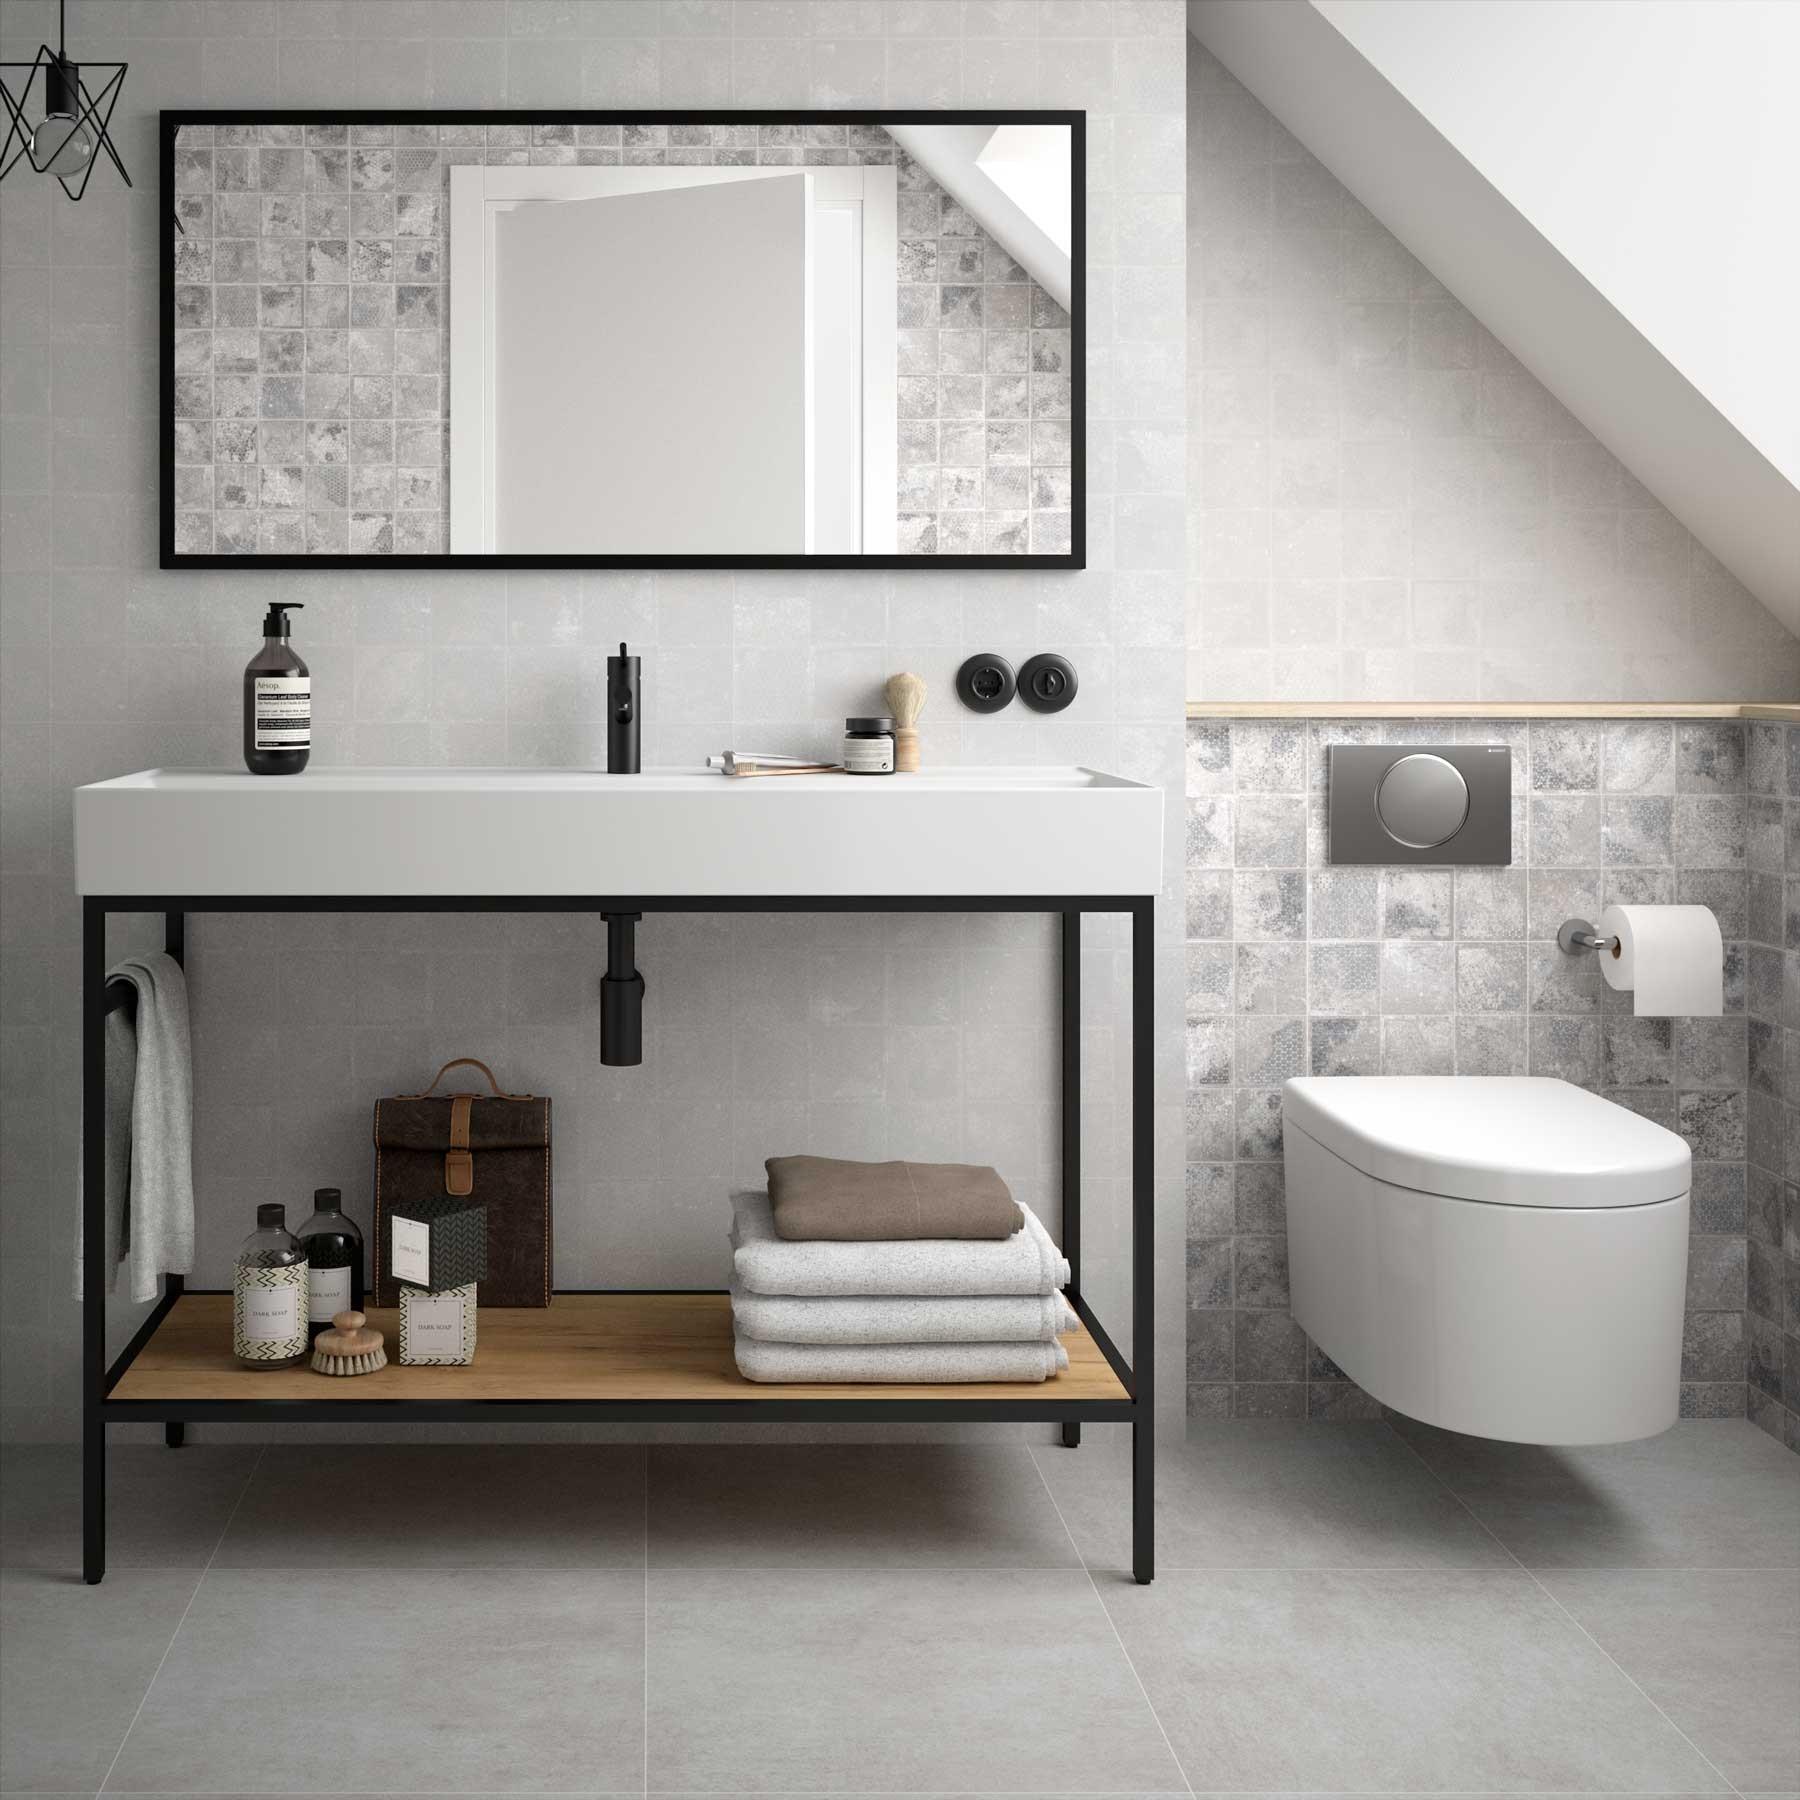 Muebles Davinci staand badkamermeubel 120cm inclusief wastafel, mat zwart frame